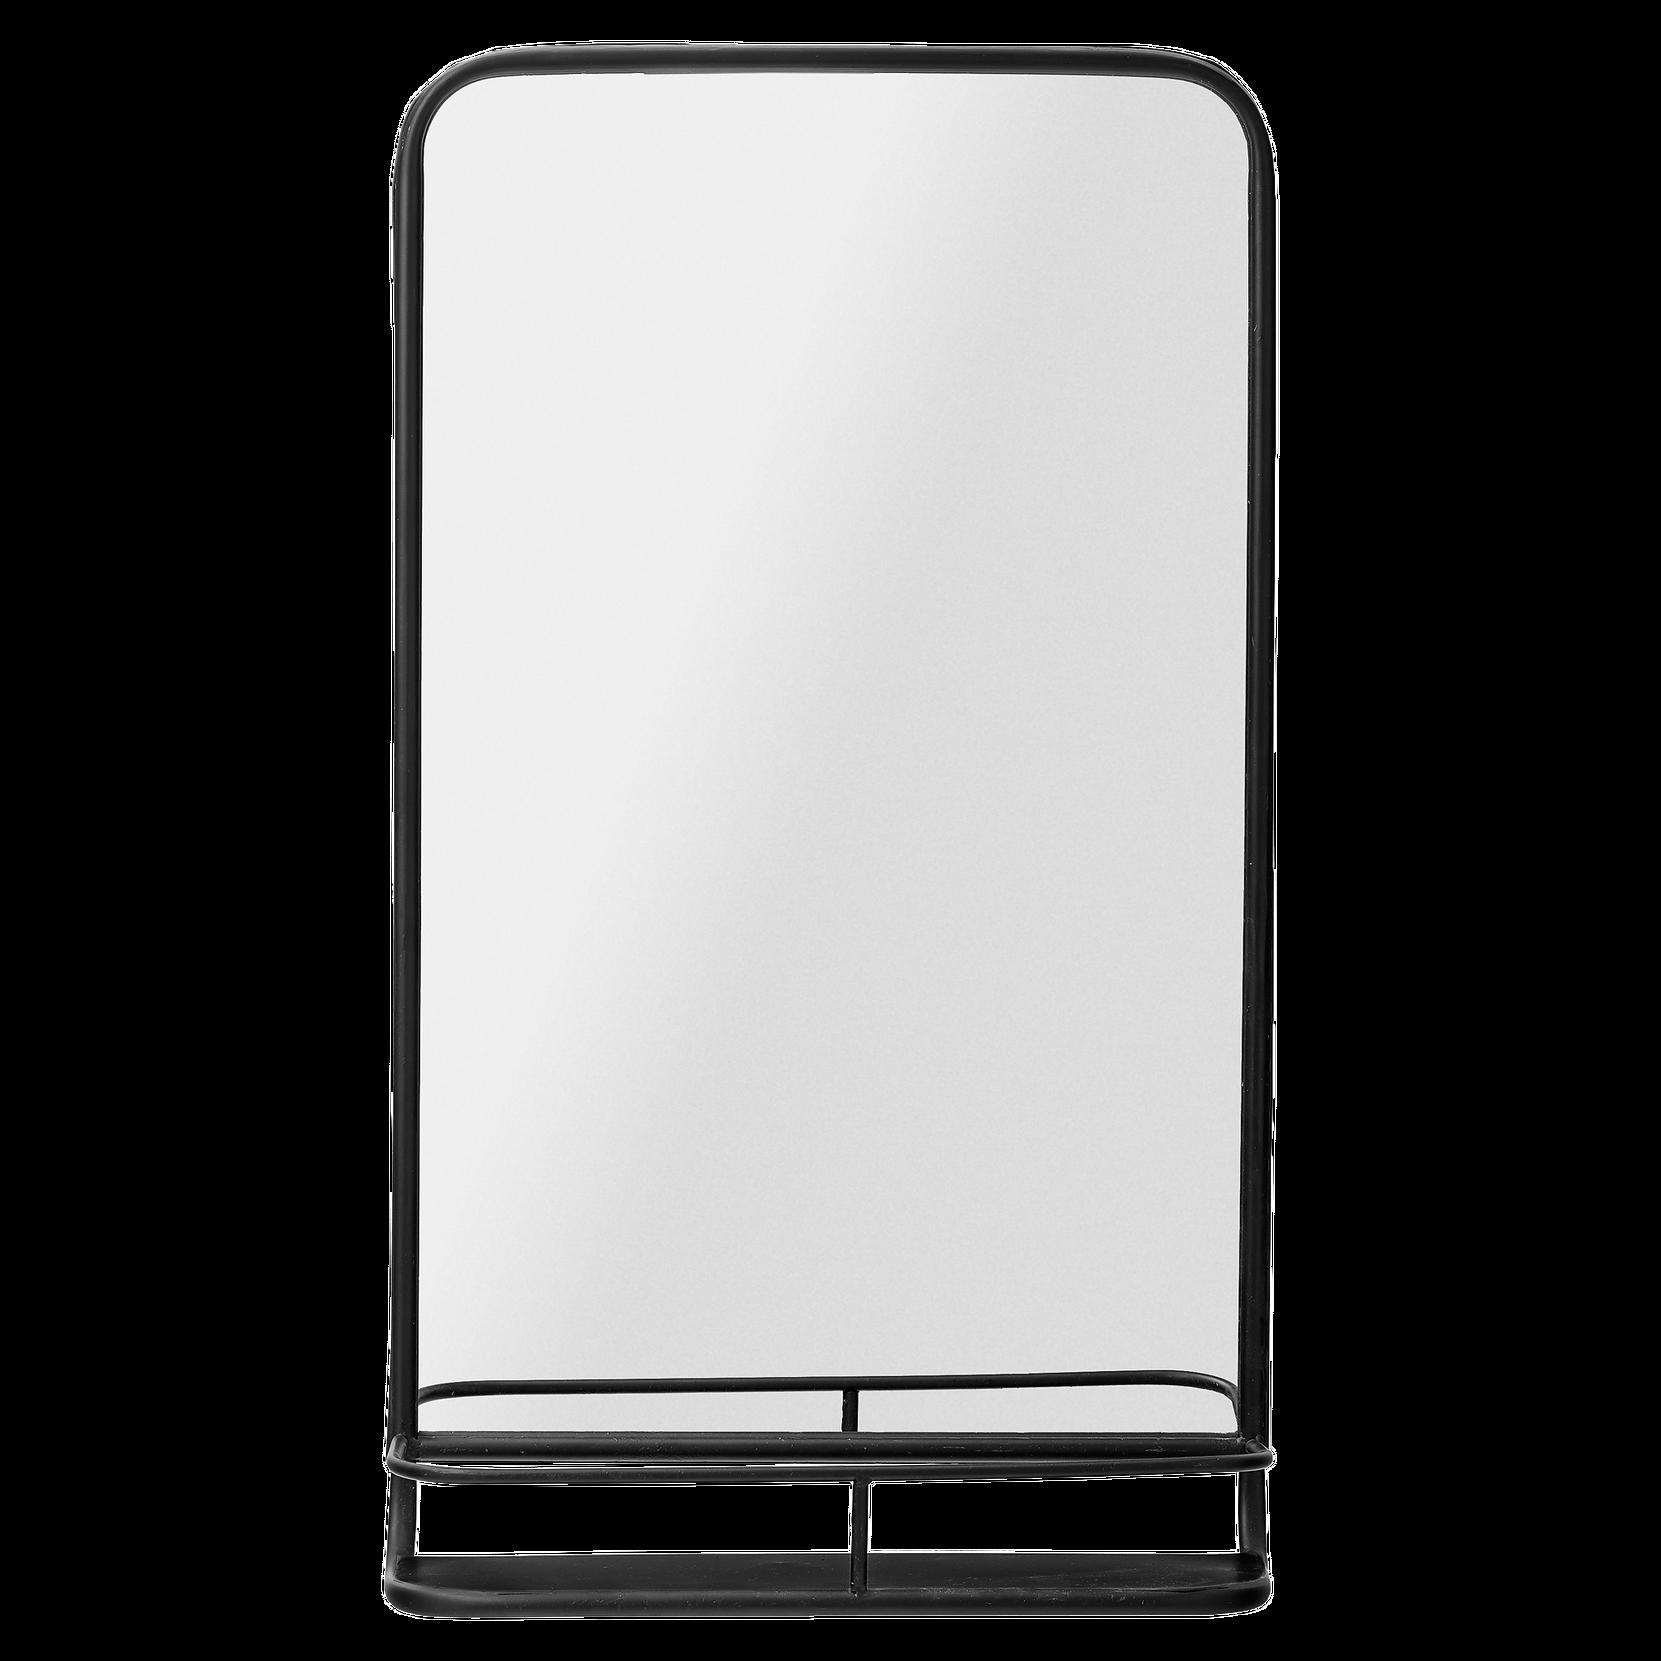 Hildia-peili, 46 x 80,5 cm.